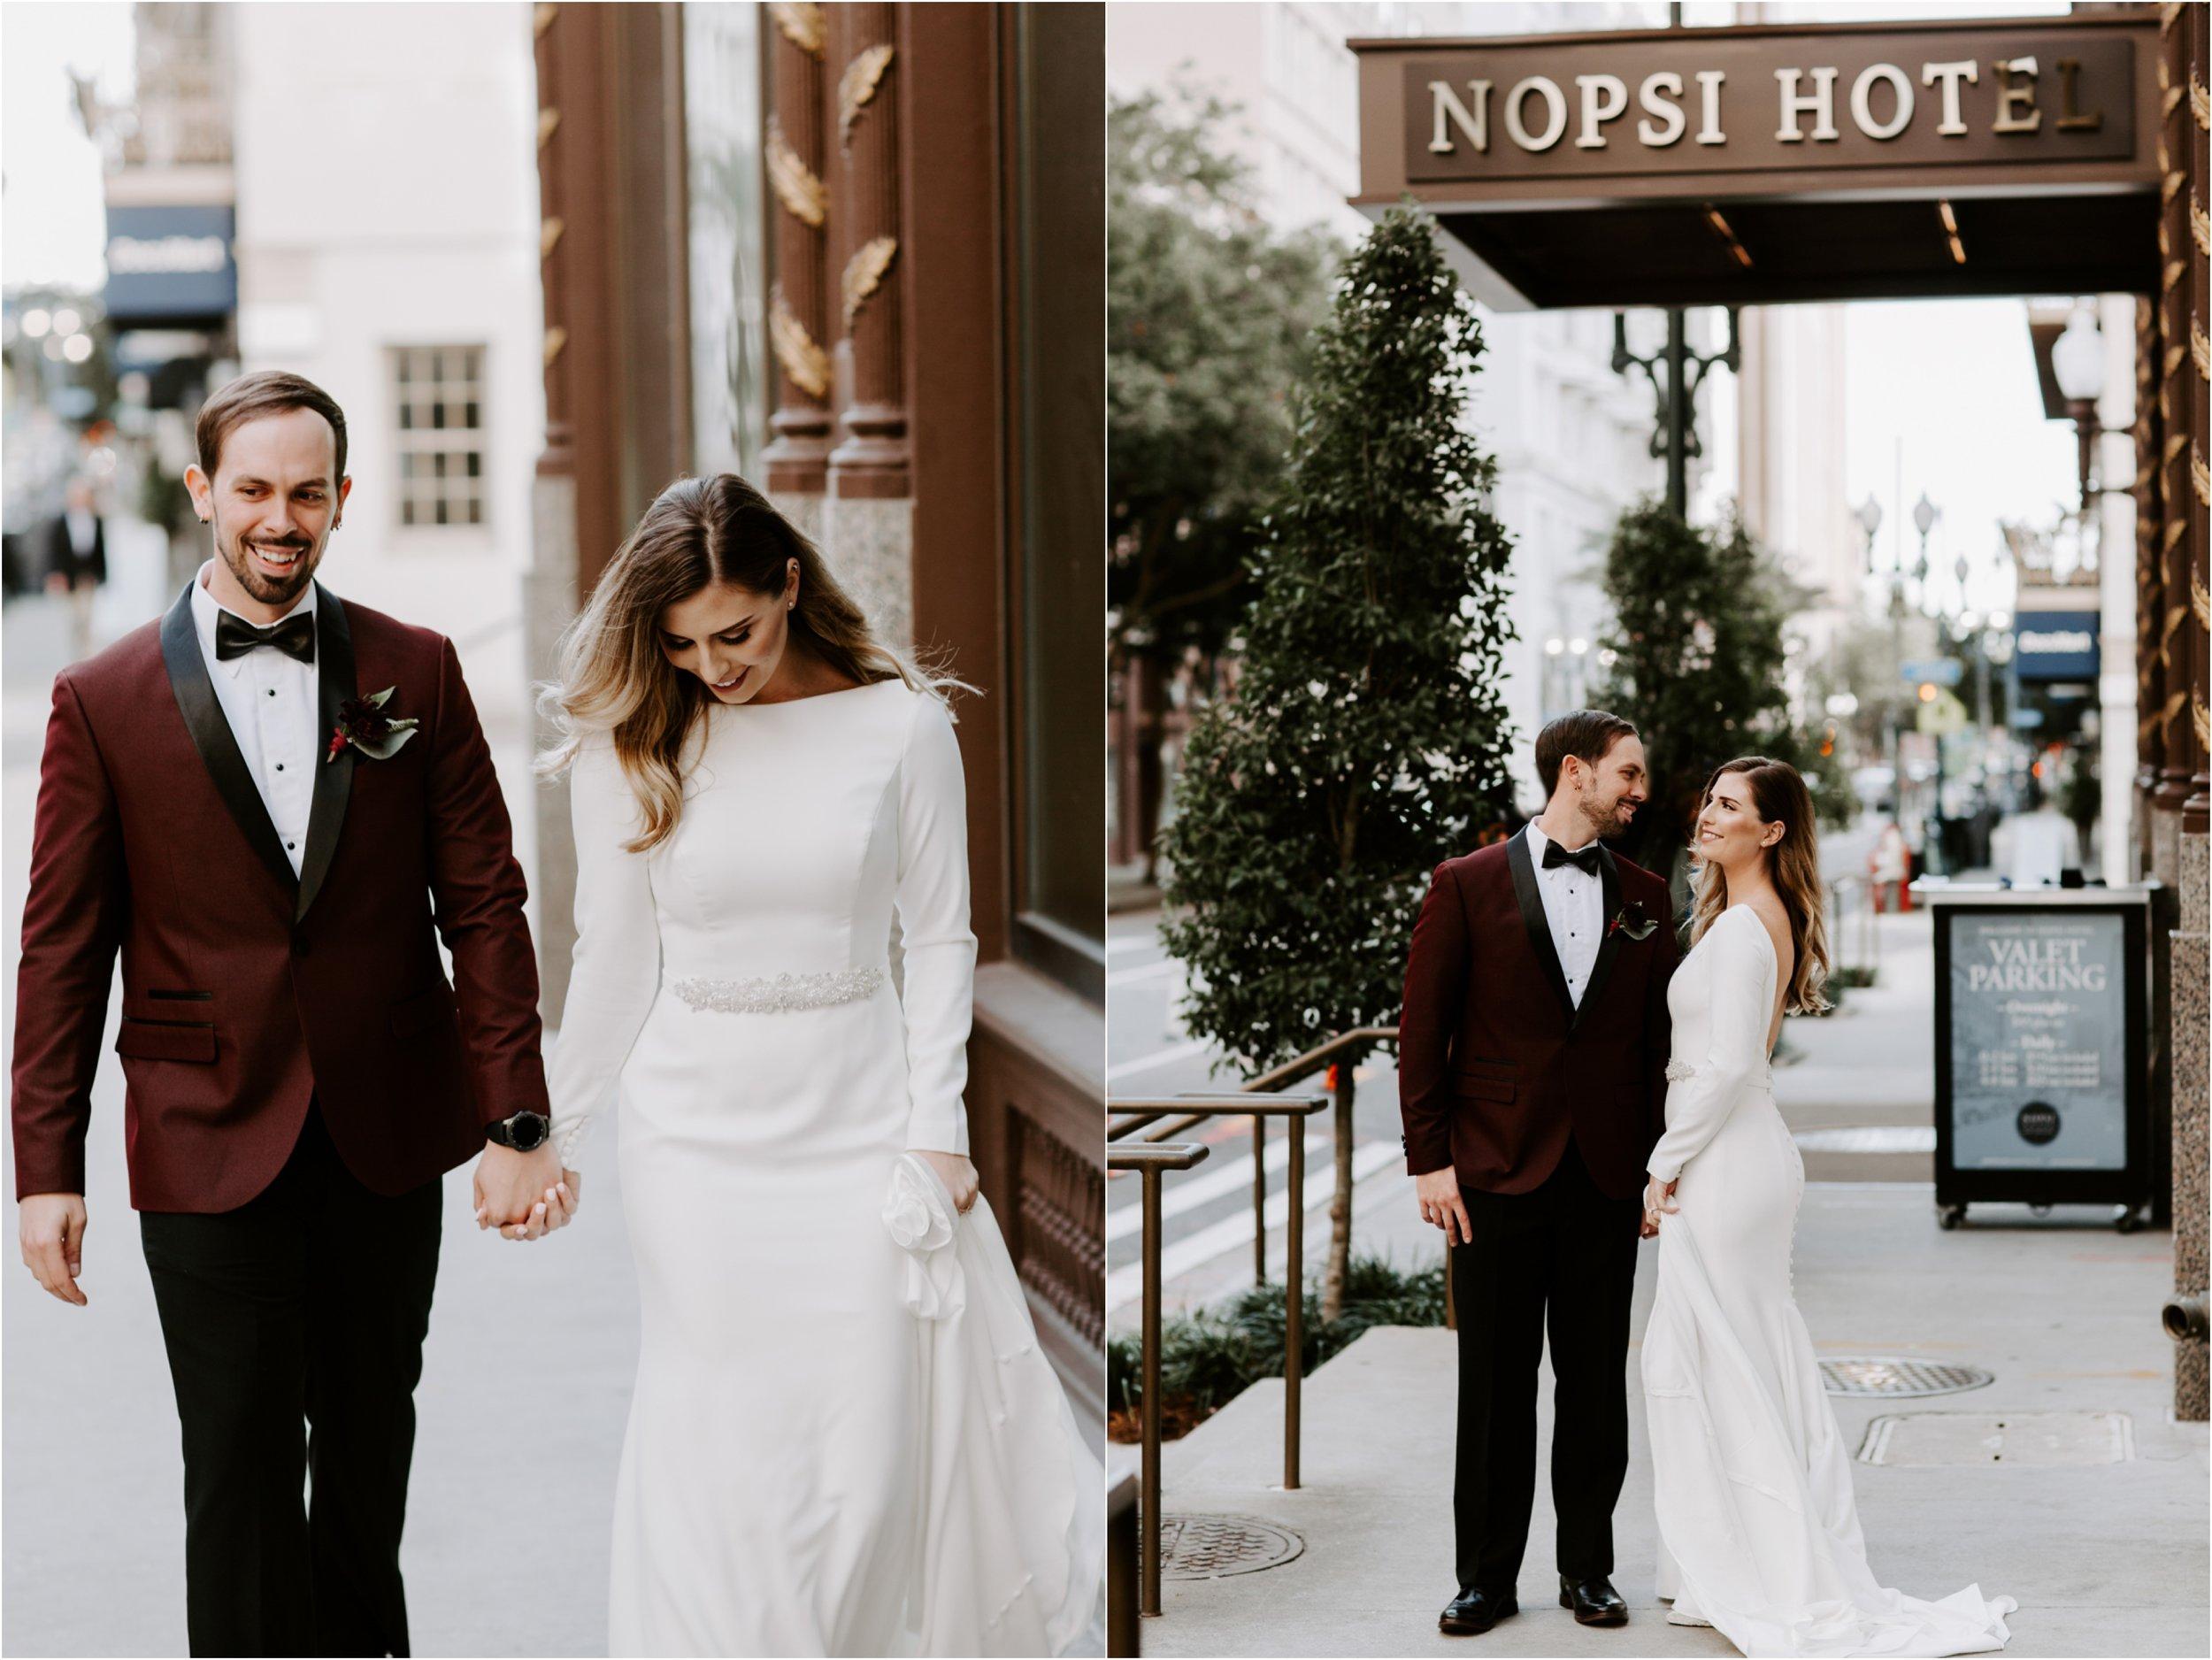 Wedding at Catahoula Hotel New Orleans Wedding Photographer49.jpg